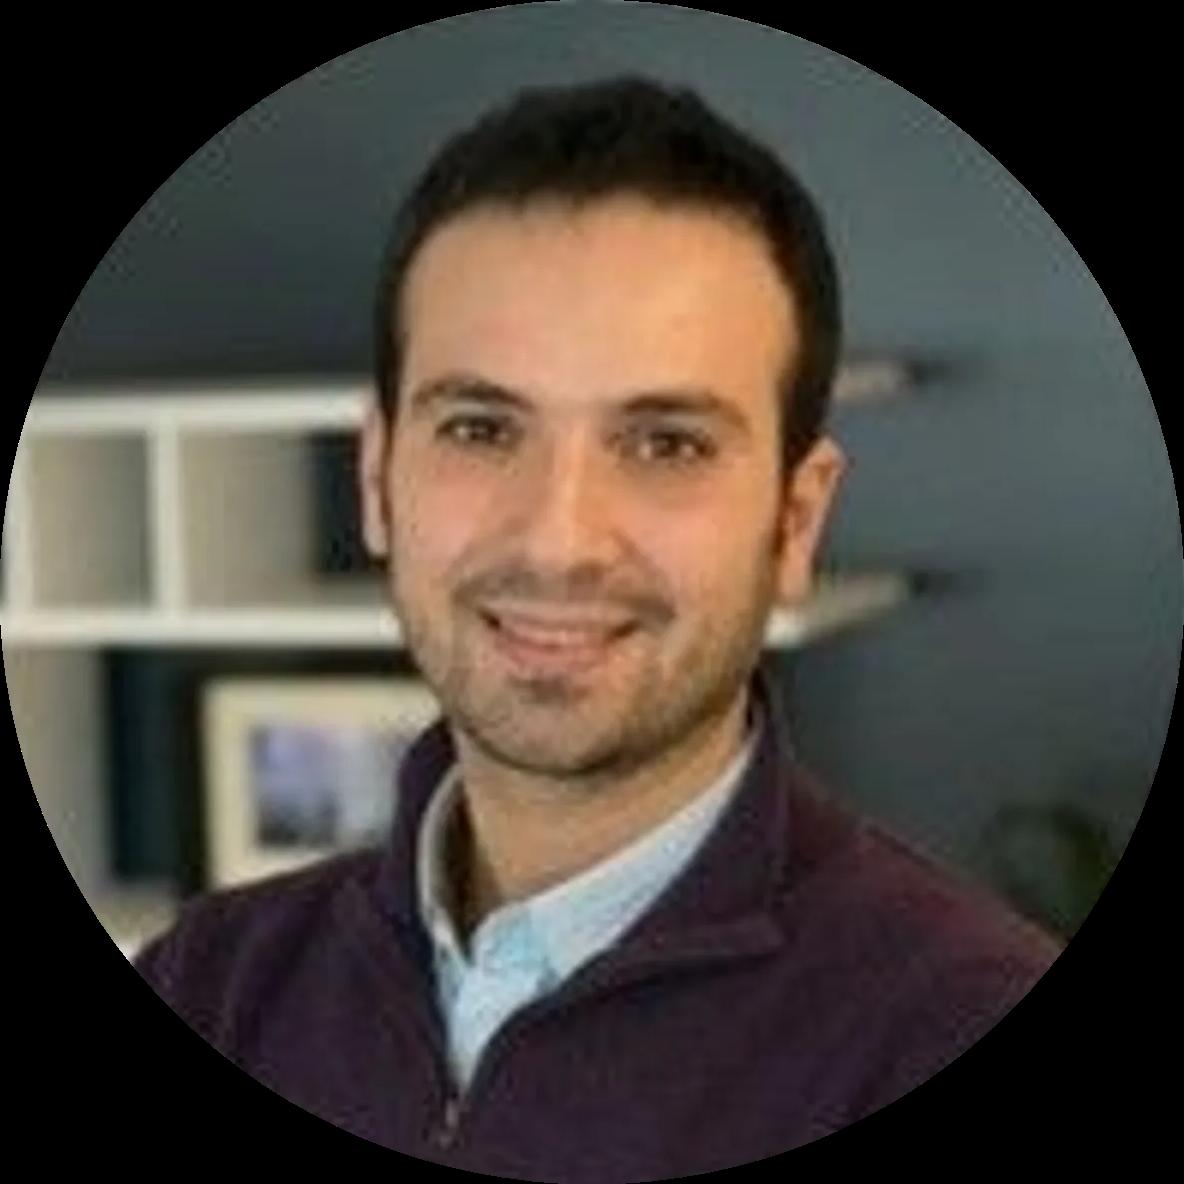 Gioacchino Morsicato 客户与销售总监